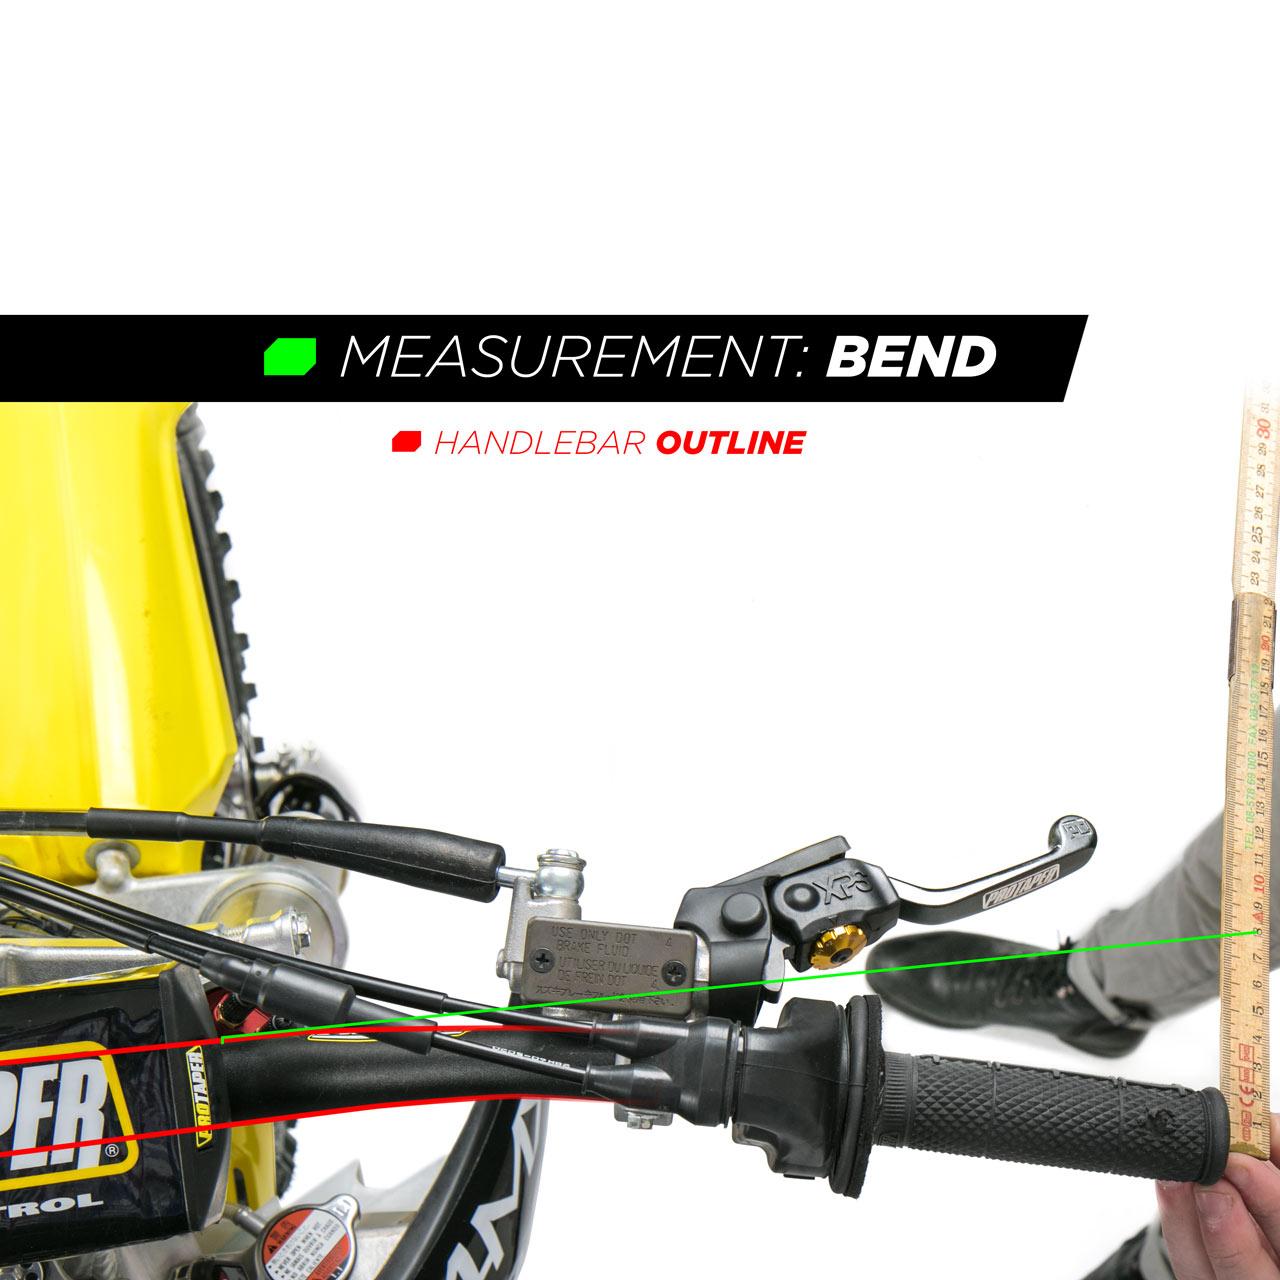 New Renthal Twinwall HandleBars Orange 997 Motocross Bars With Renthal Grips